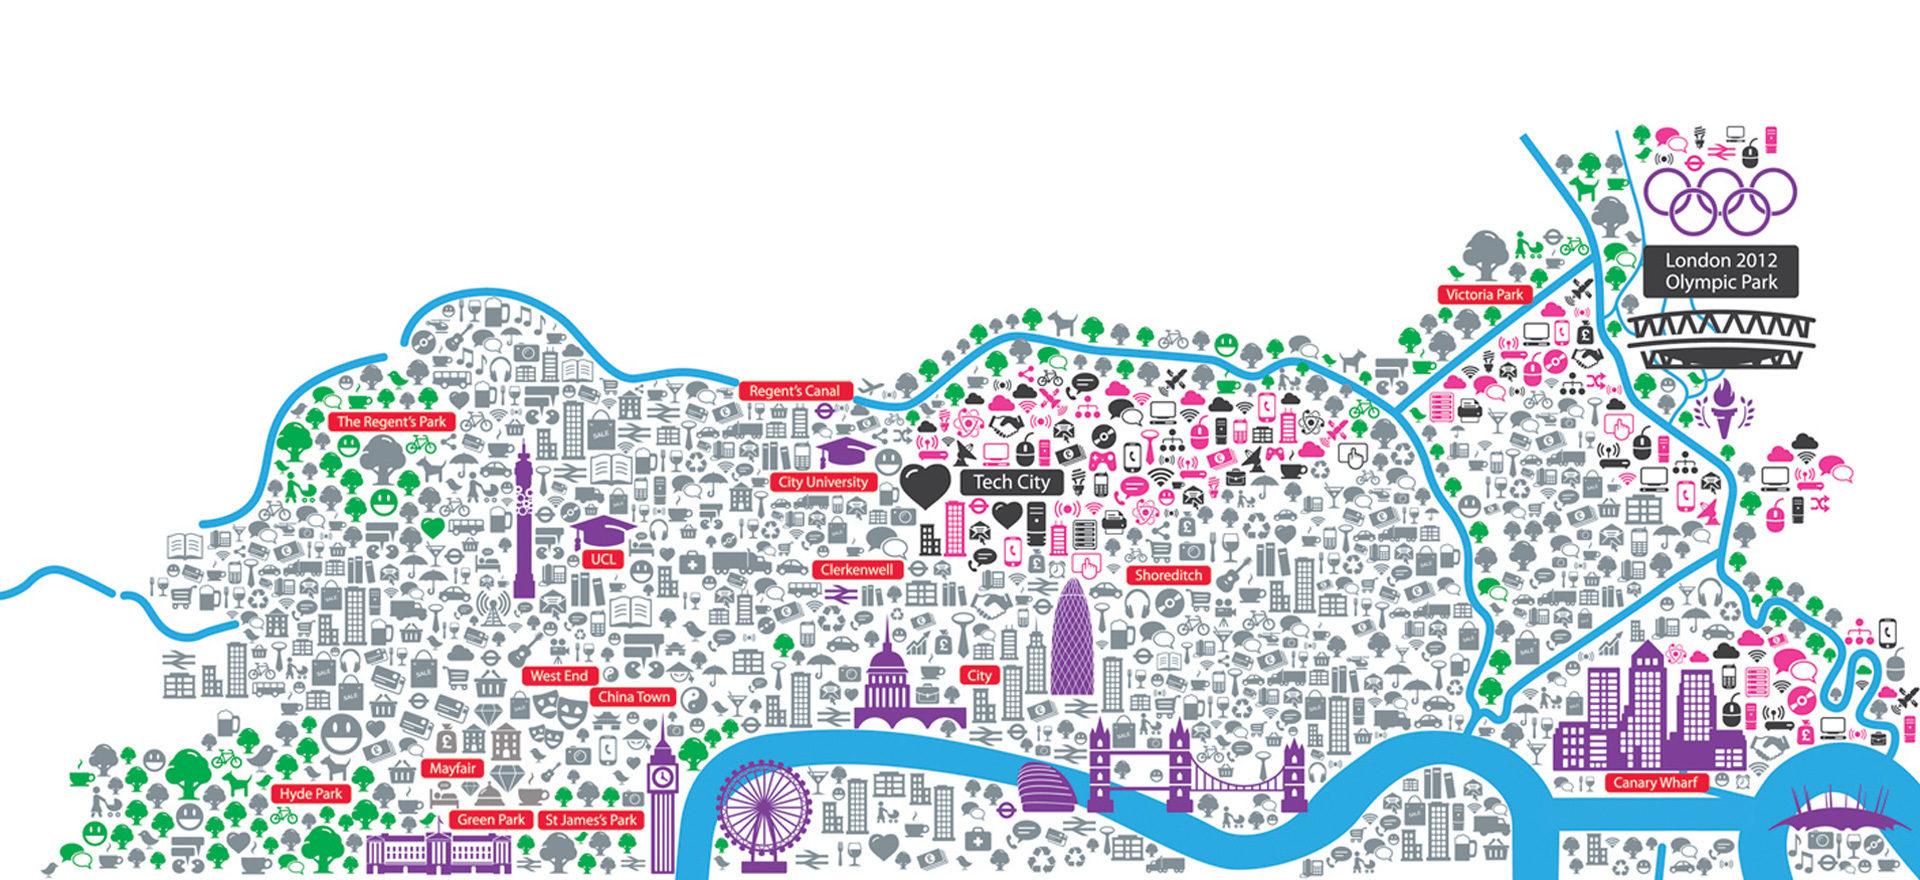 Image of East London Tech City